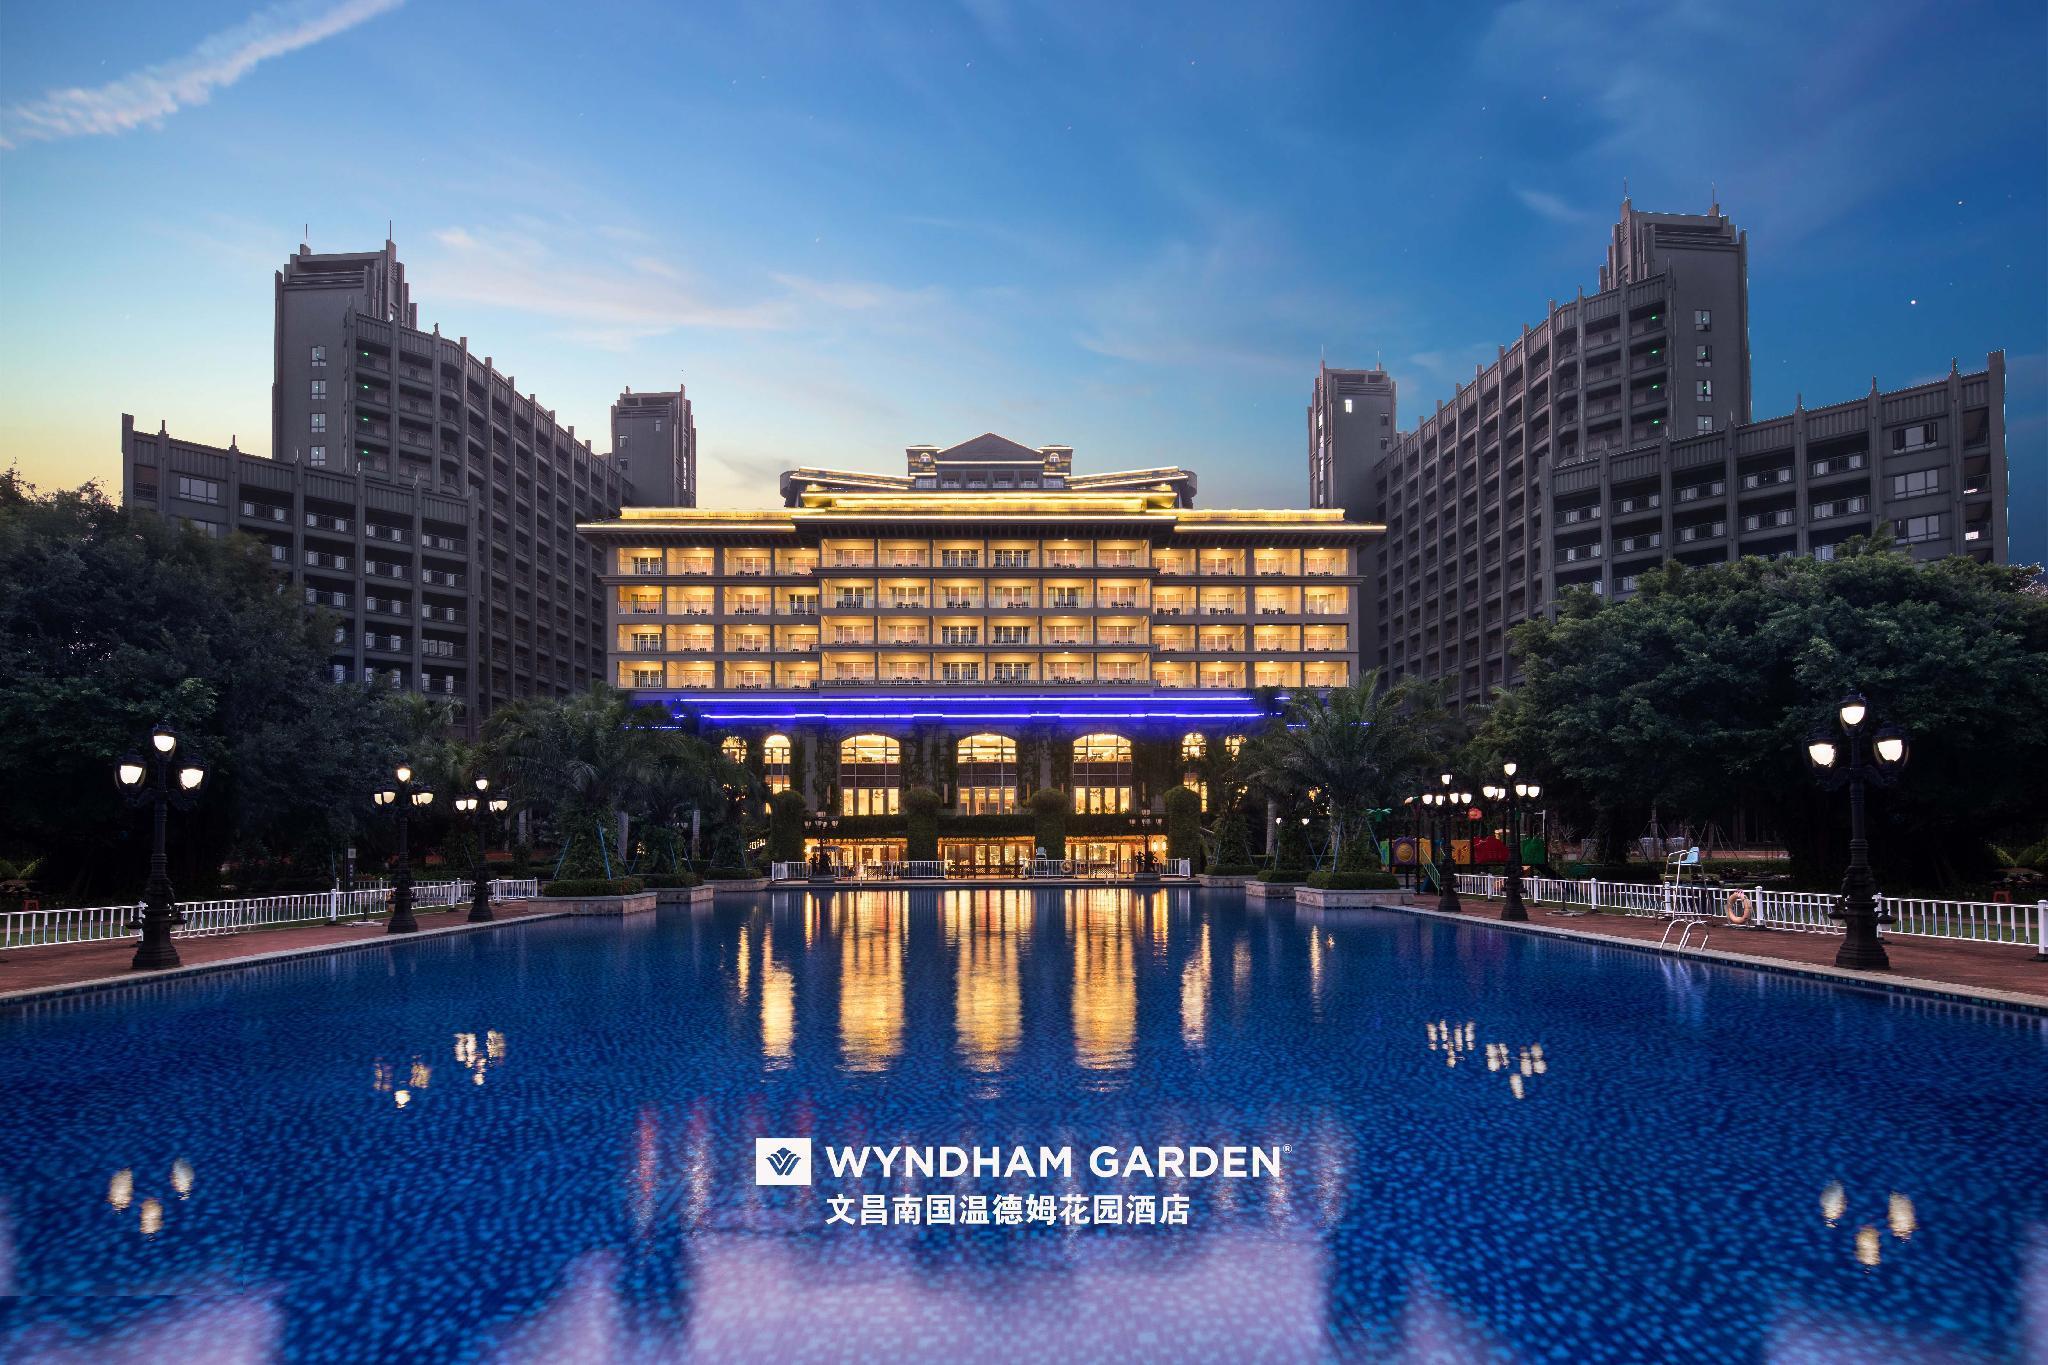 Wyndham Garden Wenchang Nanguo